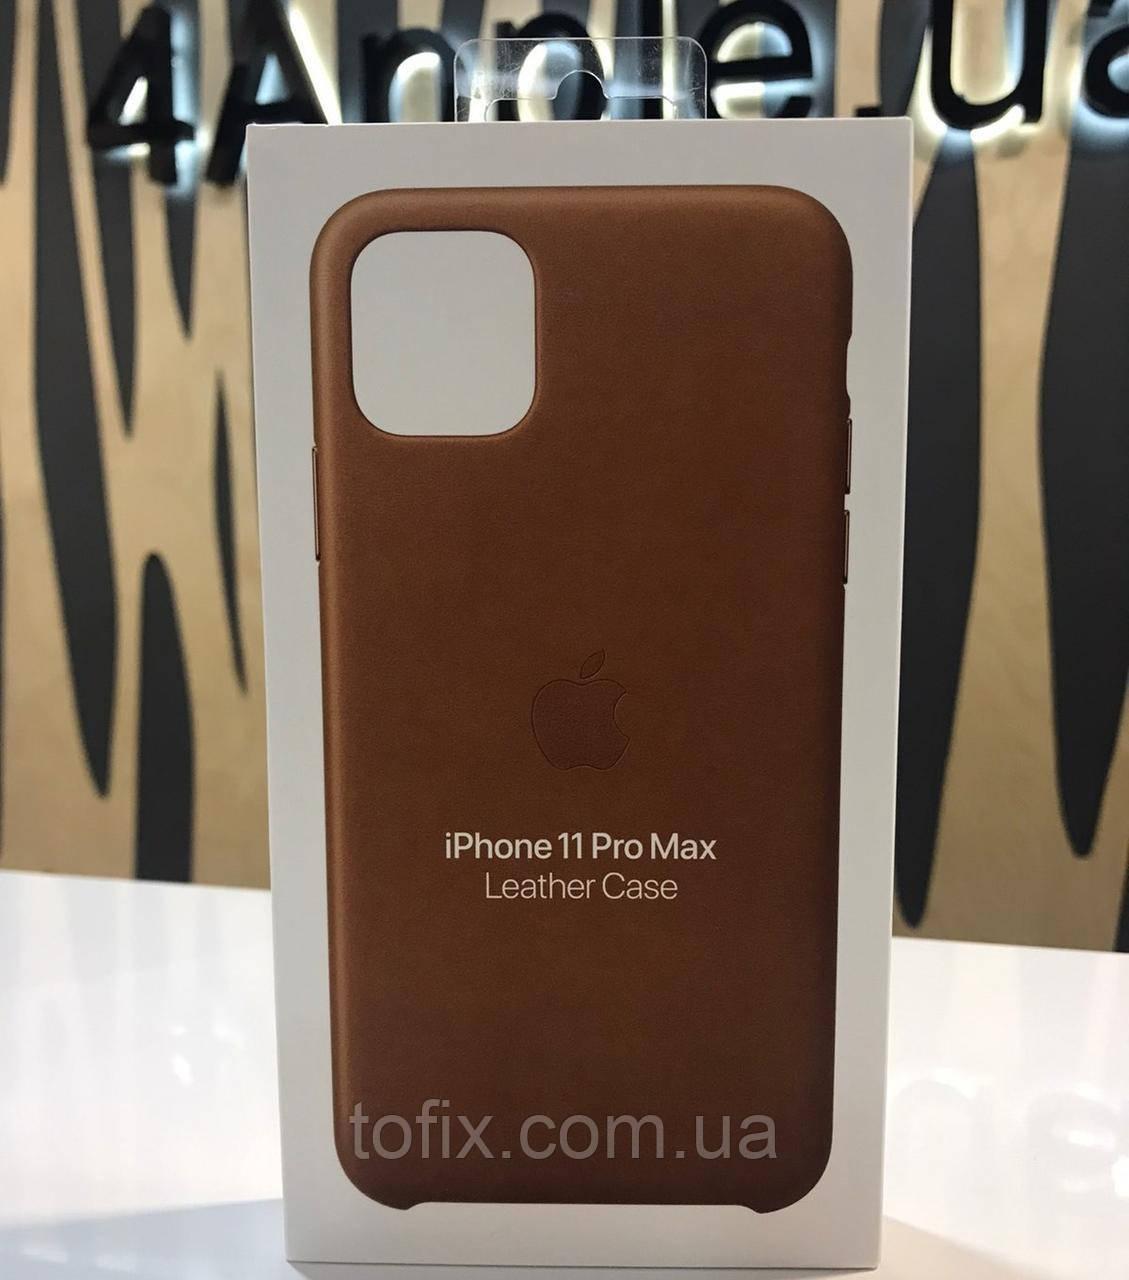 Чехол Apple Leather Case для iPhone 11 Pro Max - Saddle Brown (MWOD2ZM/A)